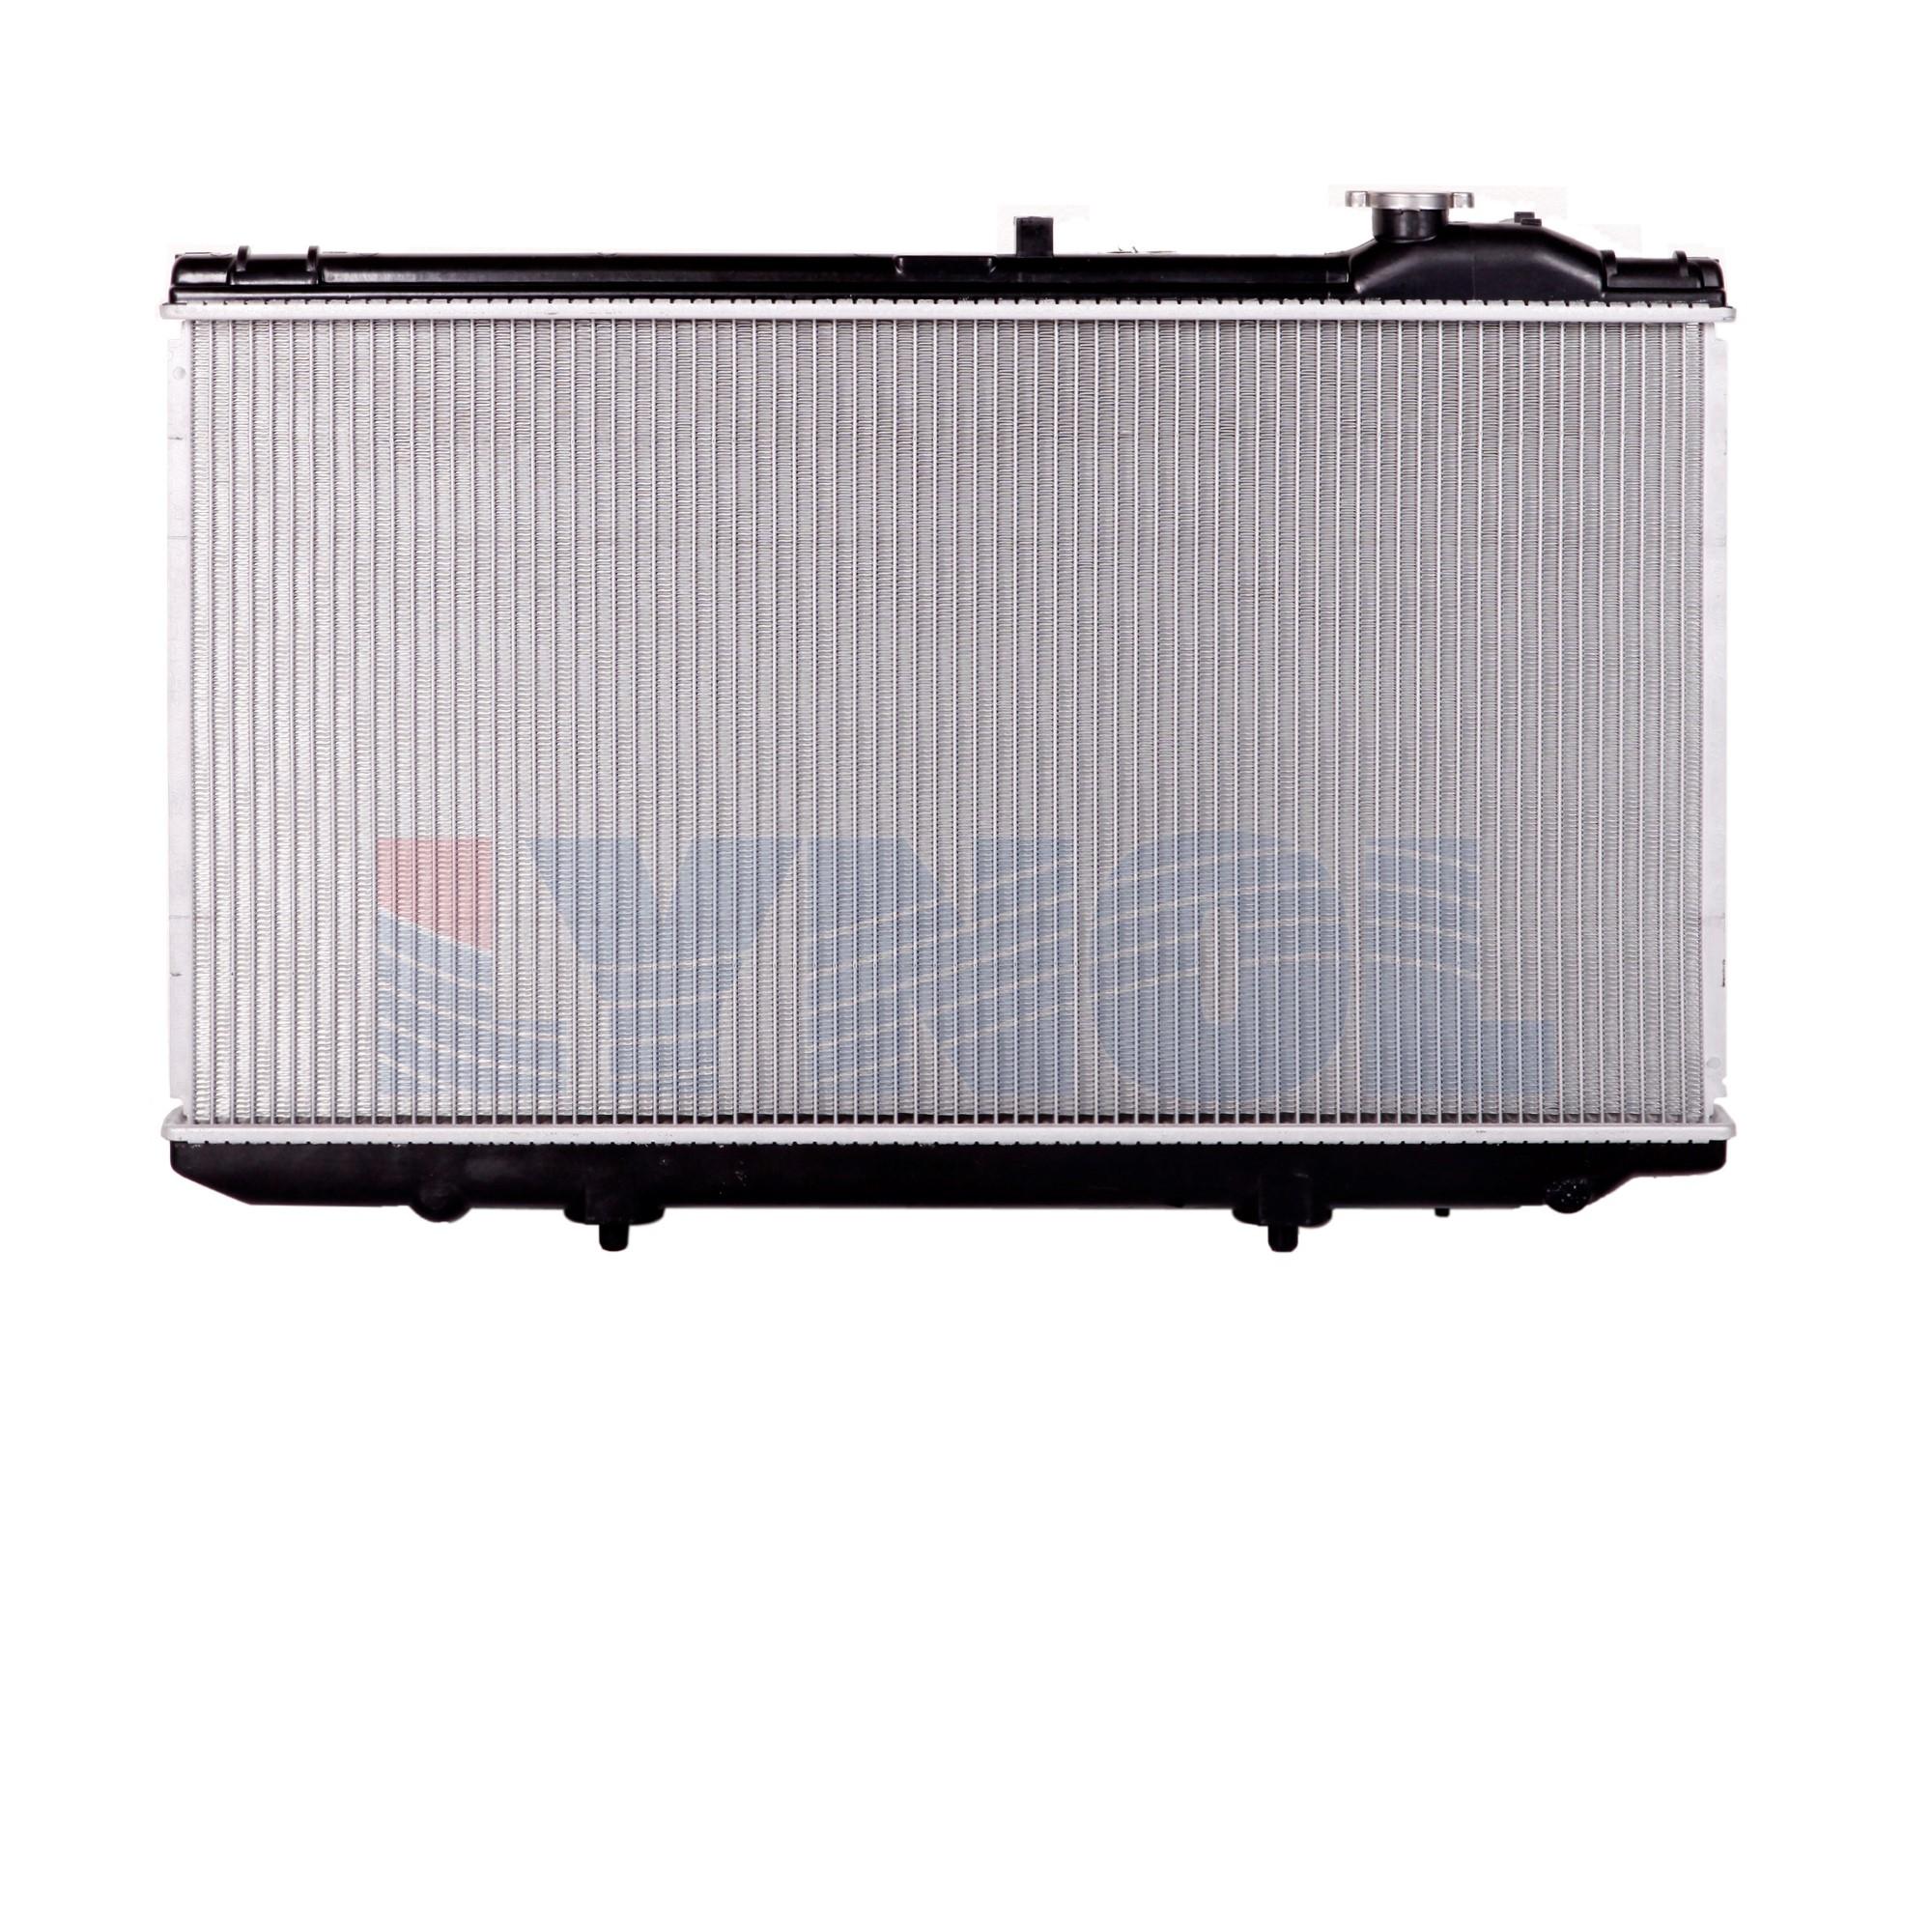 Lynol Truck Parts > Automotive Radiator > LR2222